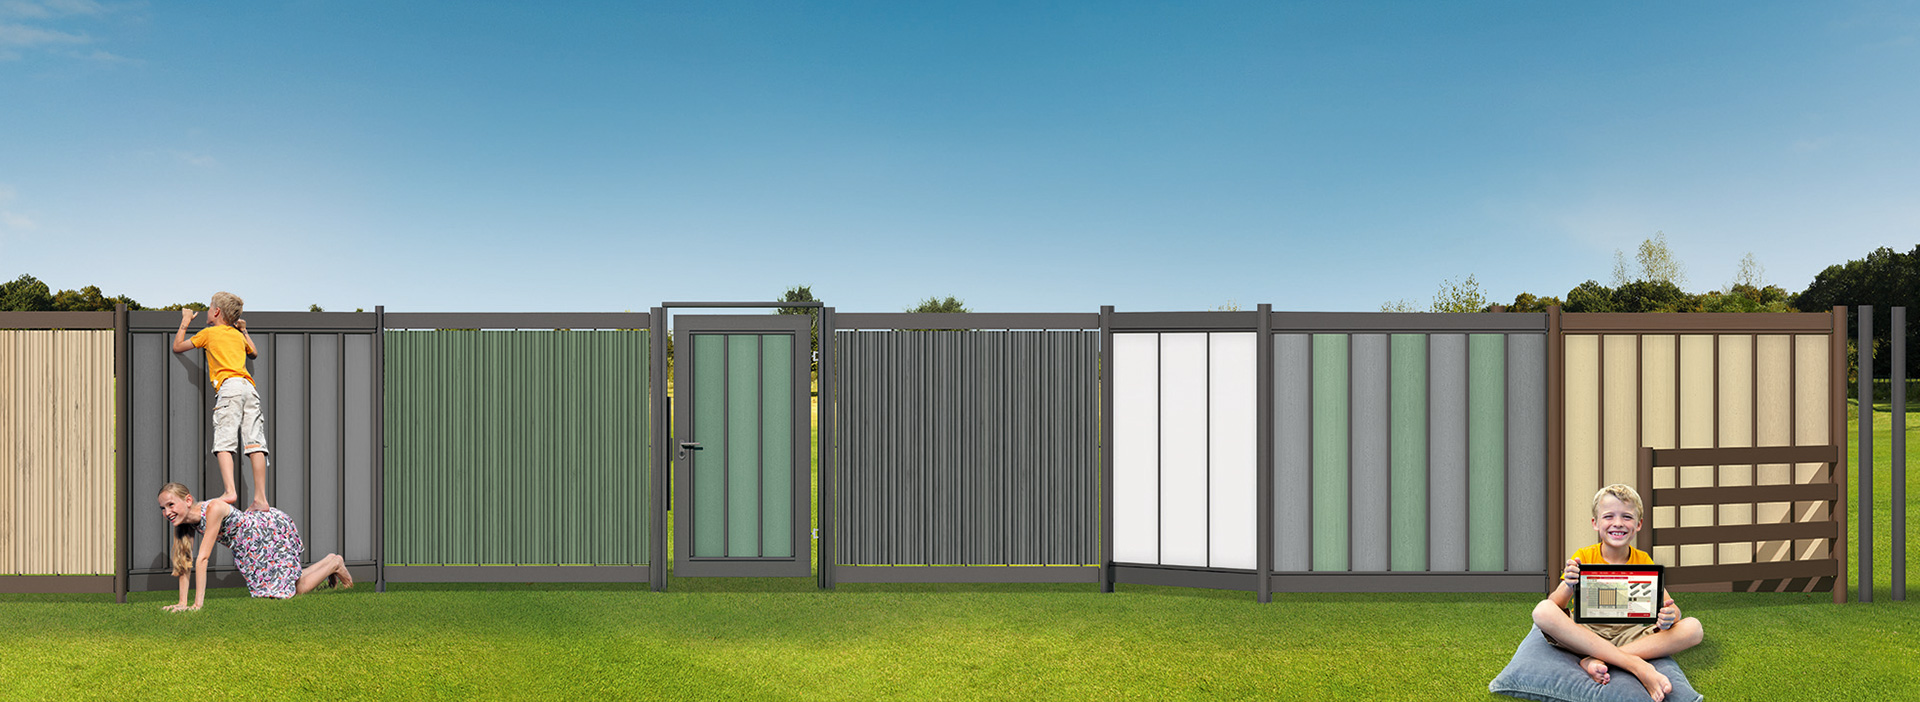 megawood Terrassensystem - Zaun